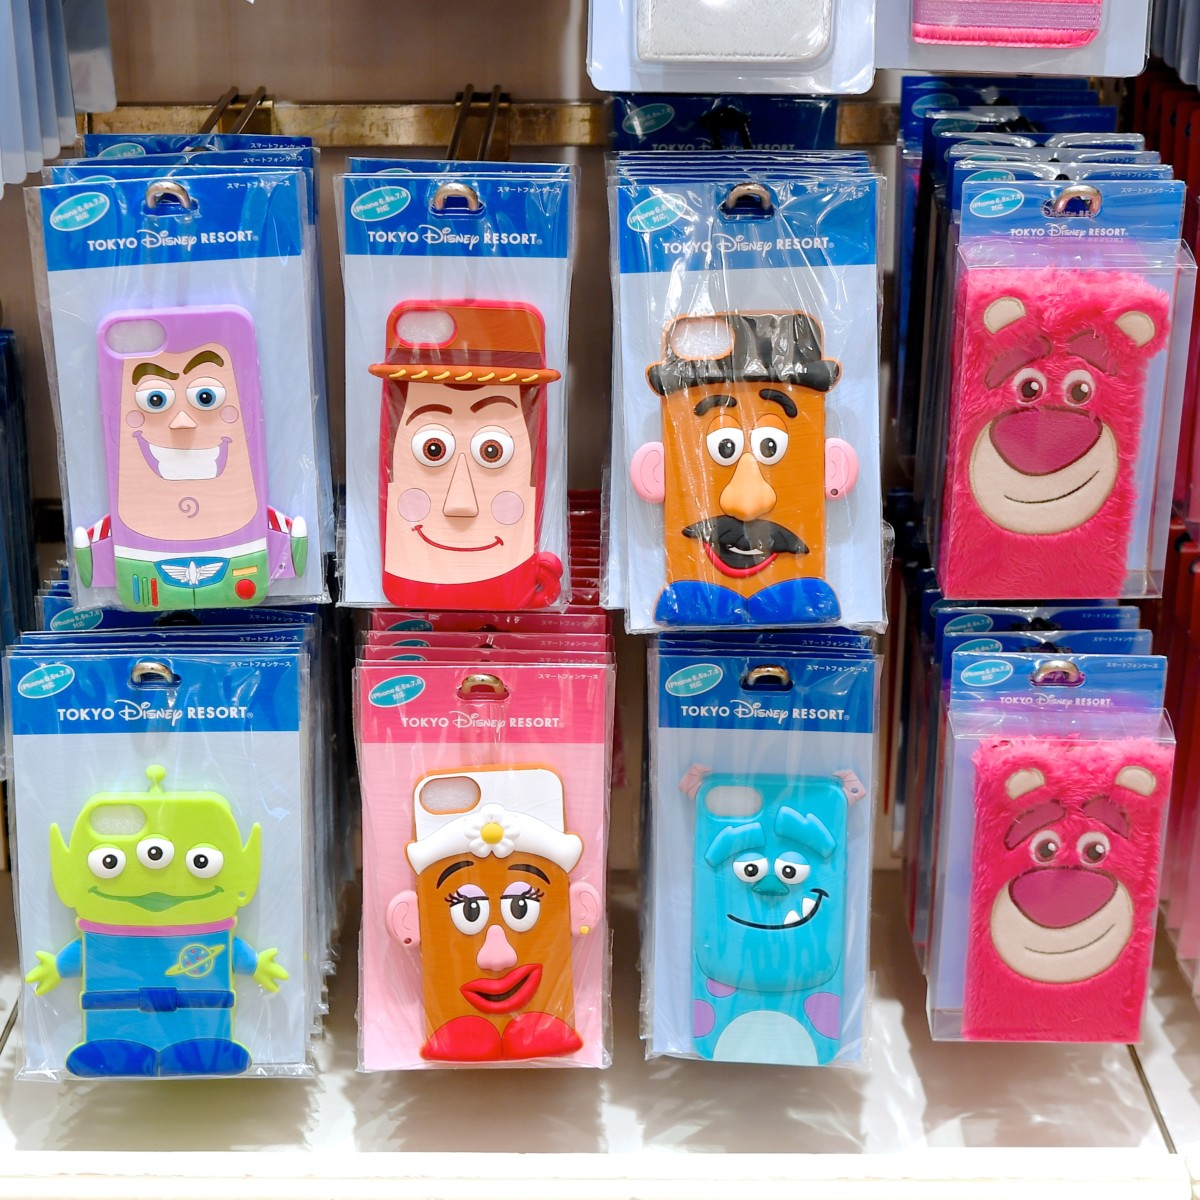 Iphoneに加え多機種対応も続々 東京ディズニーランド 2018秋冬